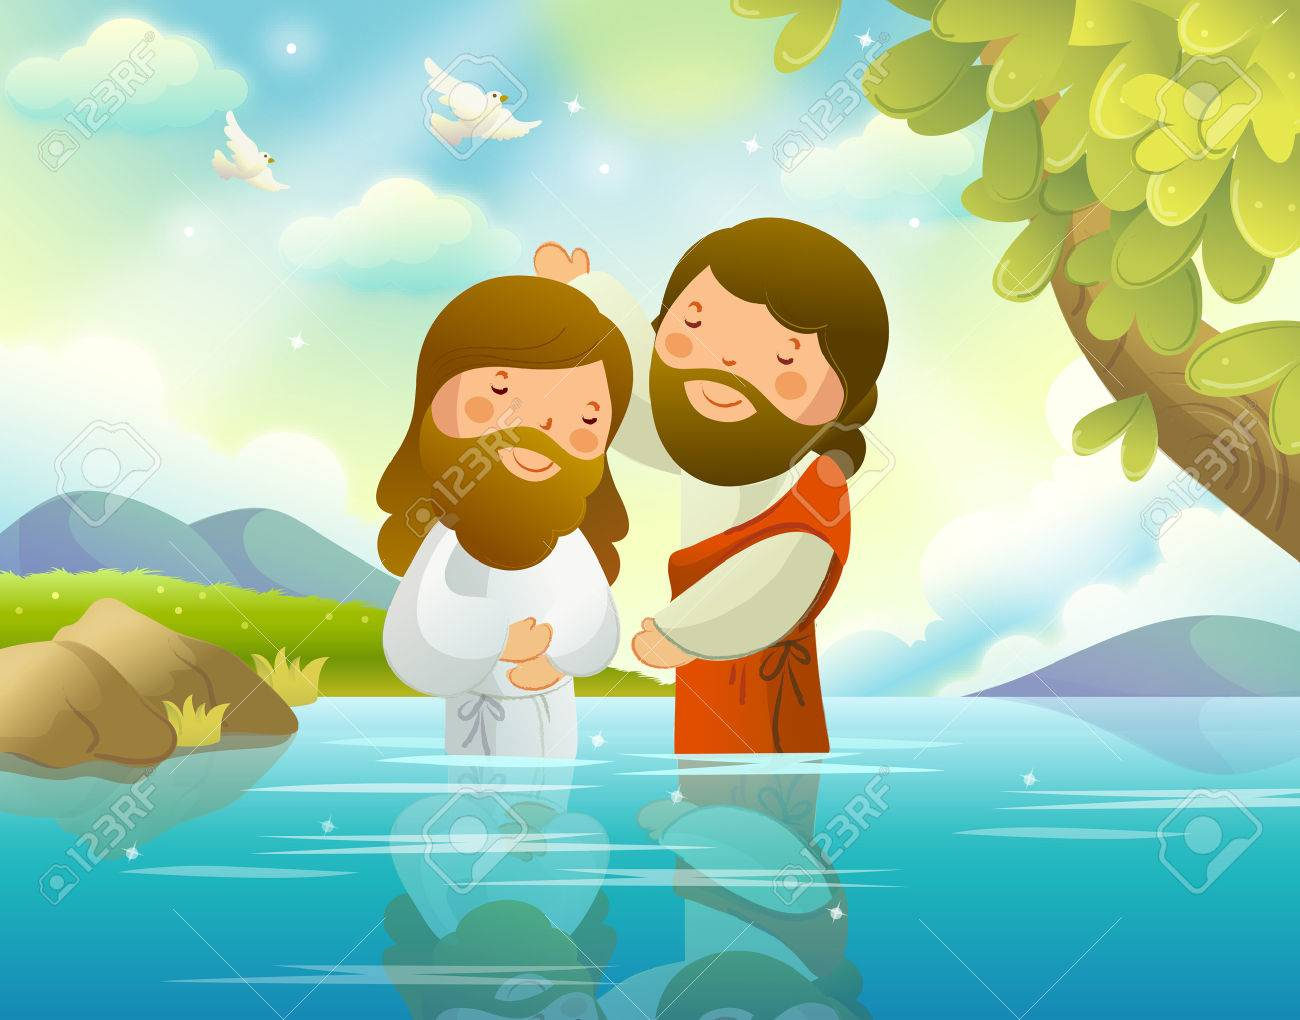 Baptism of Jesus Christ by John the Baptist.